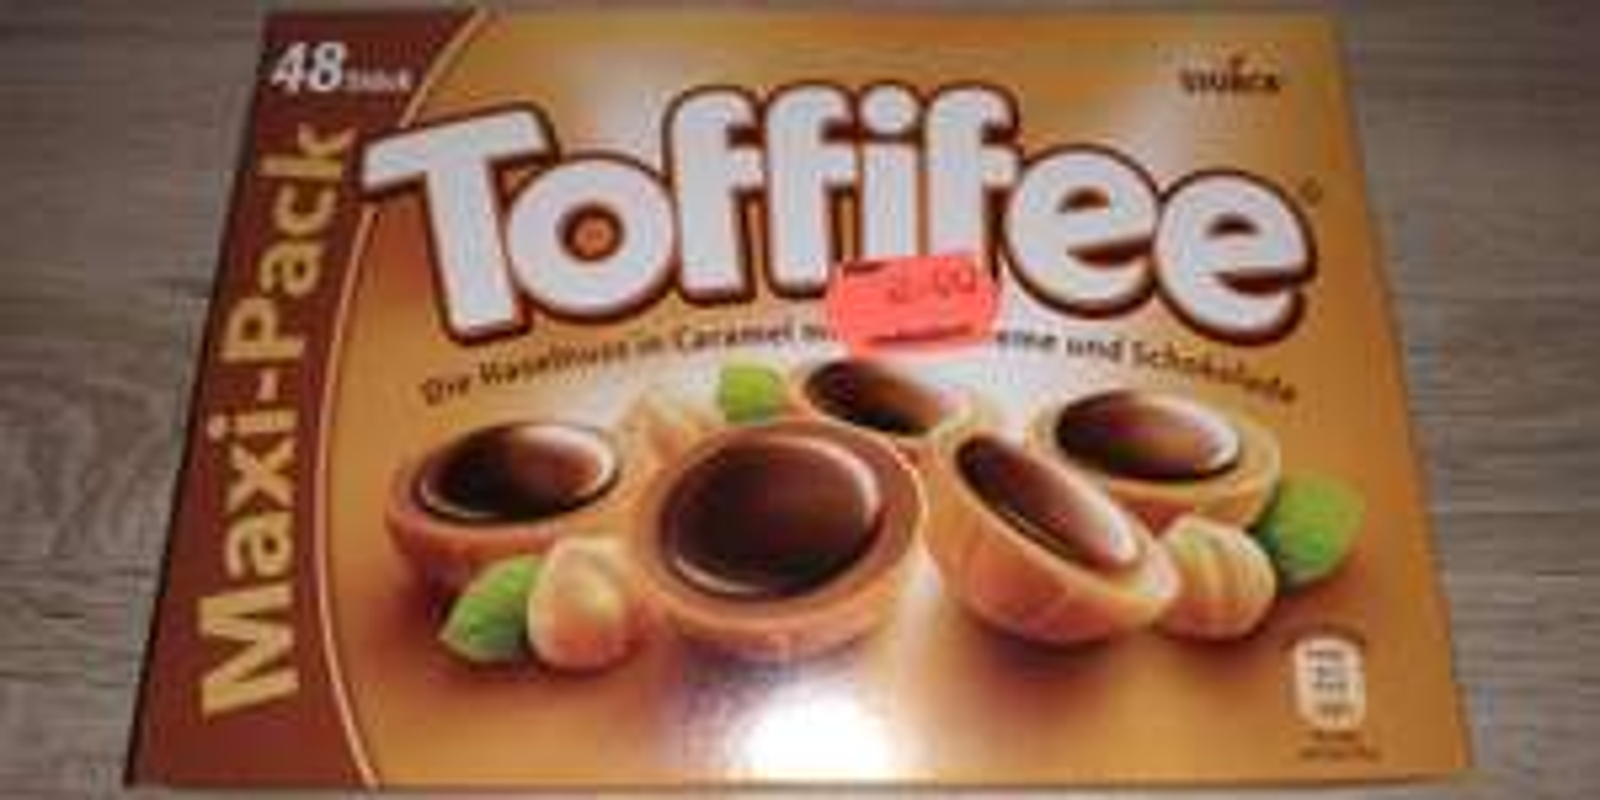 [LOKAL real Berlin-Hellersdorf] - Toffifee - 48 Stück für 2,00€